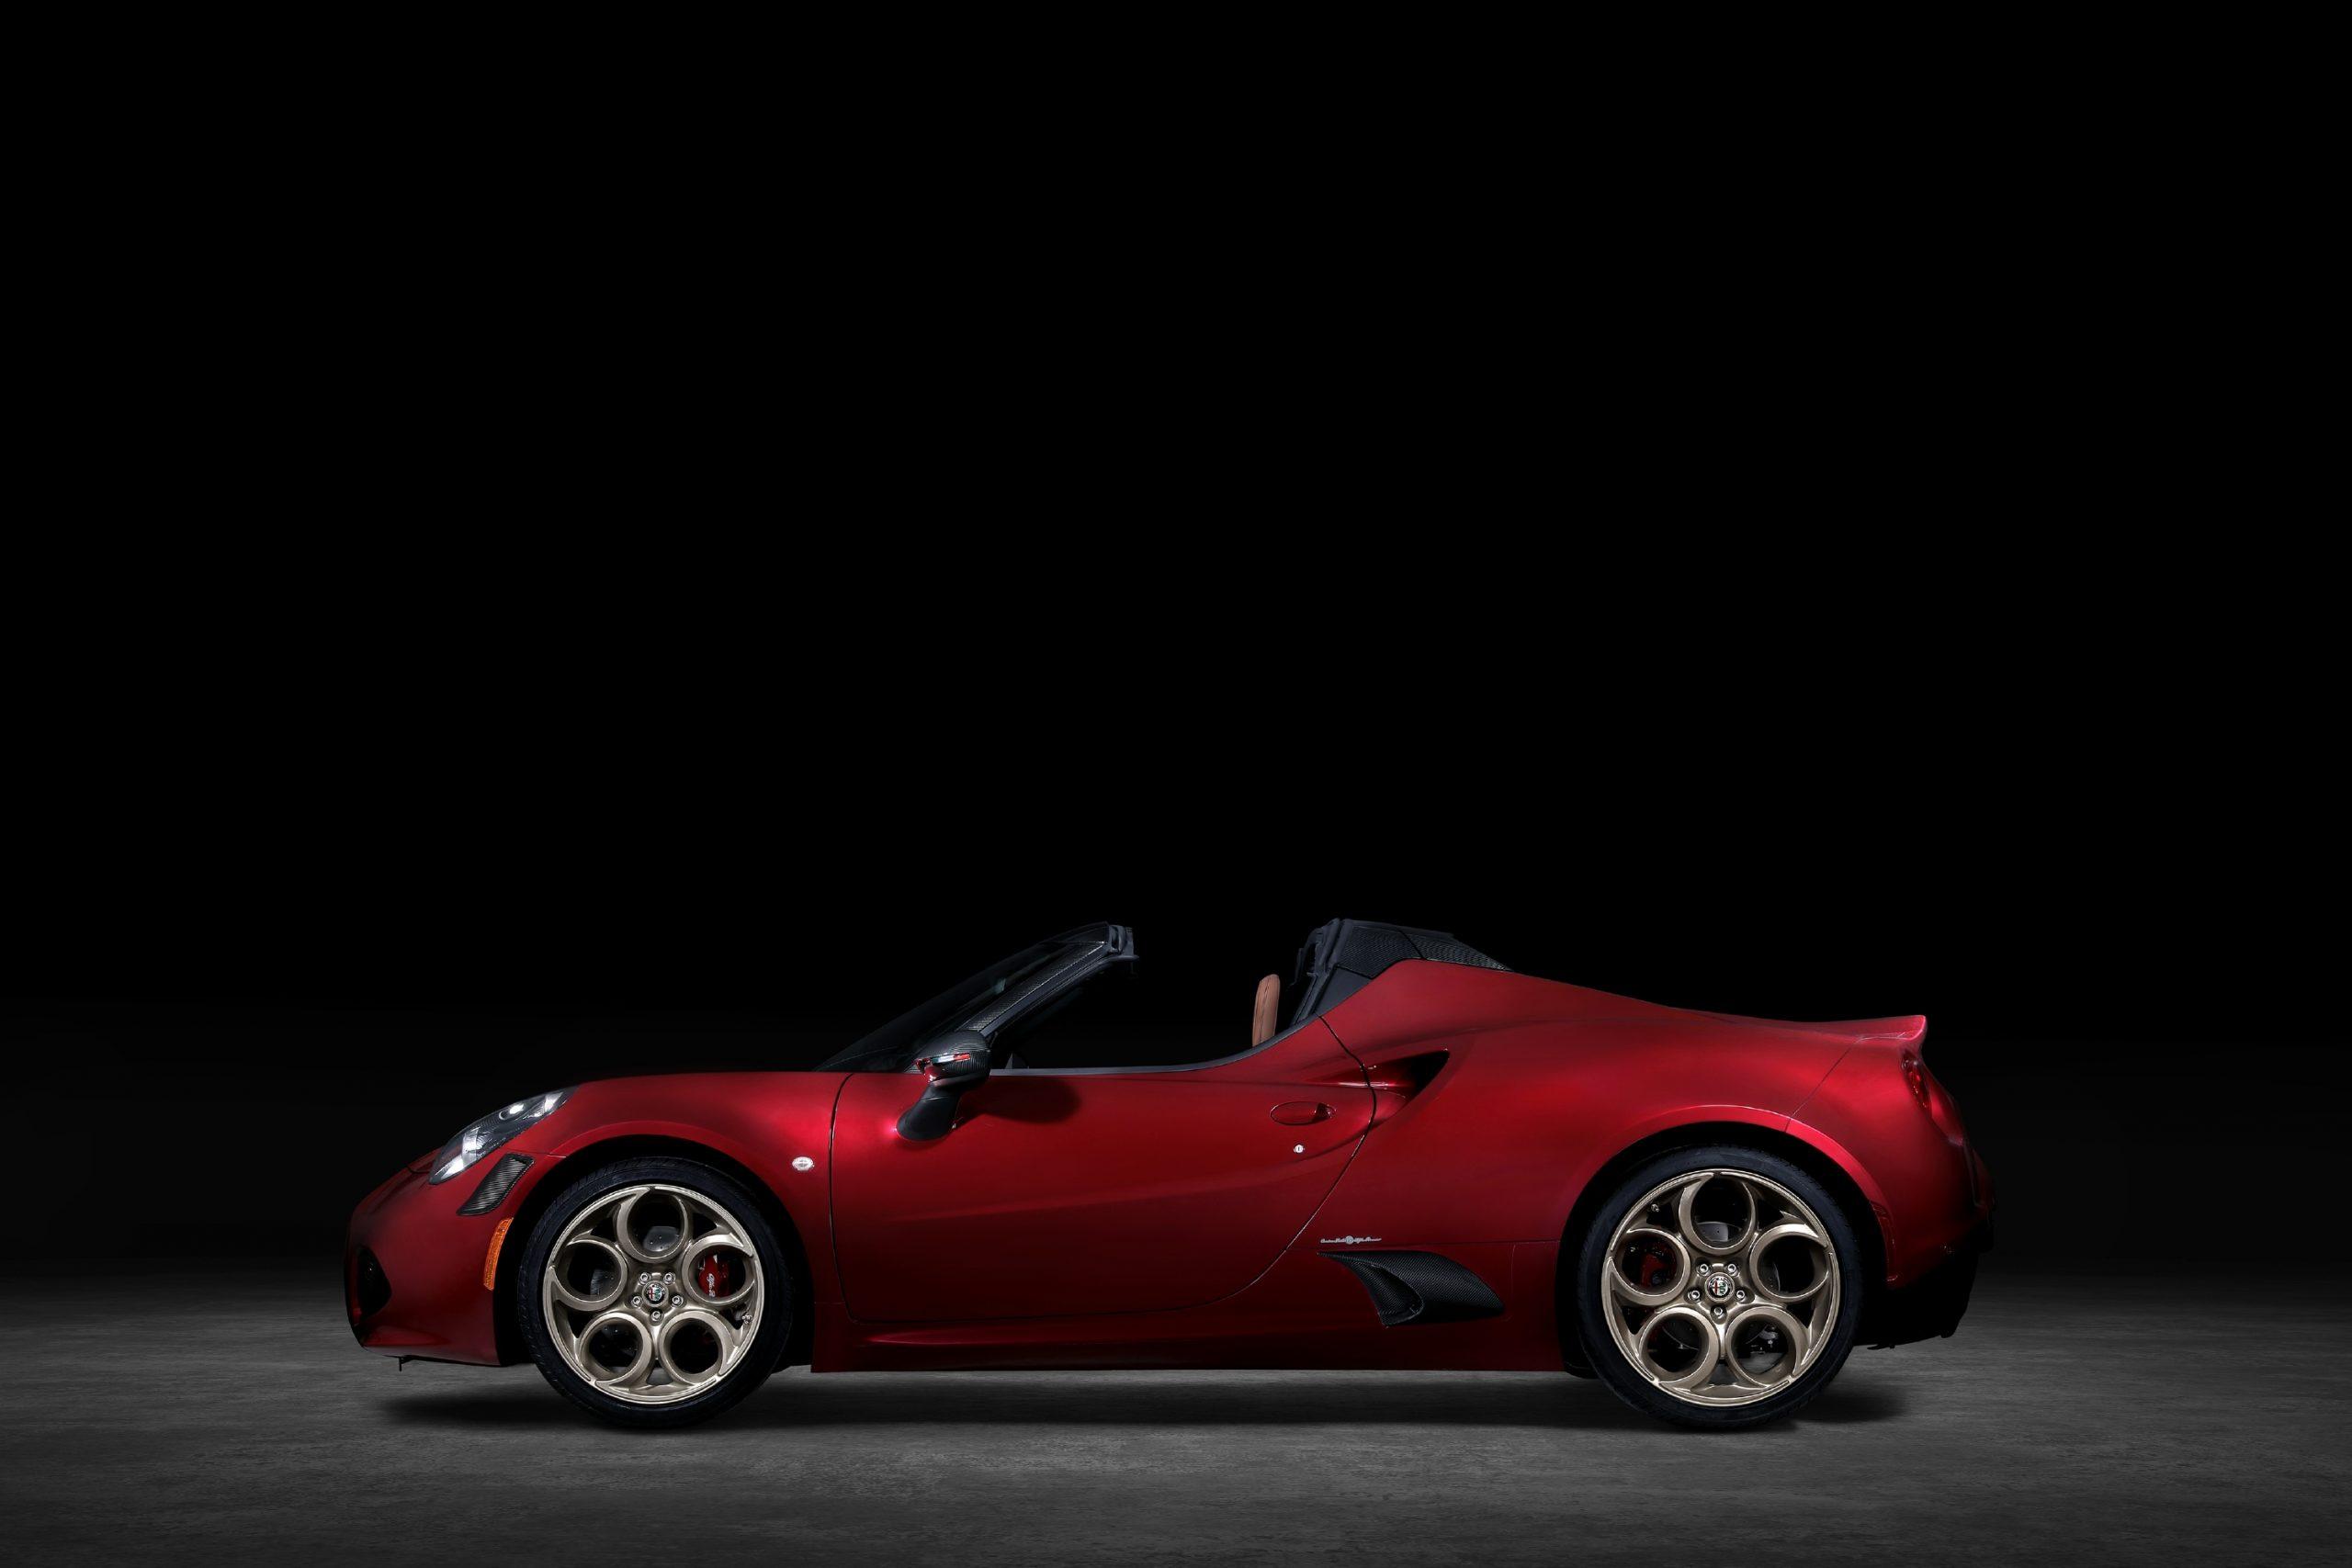 2020 Alfa Romeo 4C Spider 33 Stradale Tributo profile